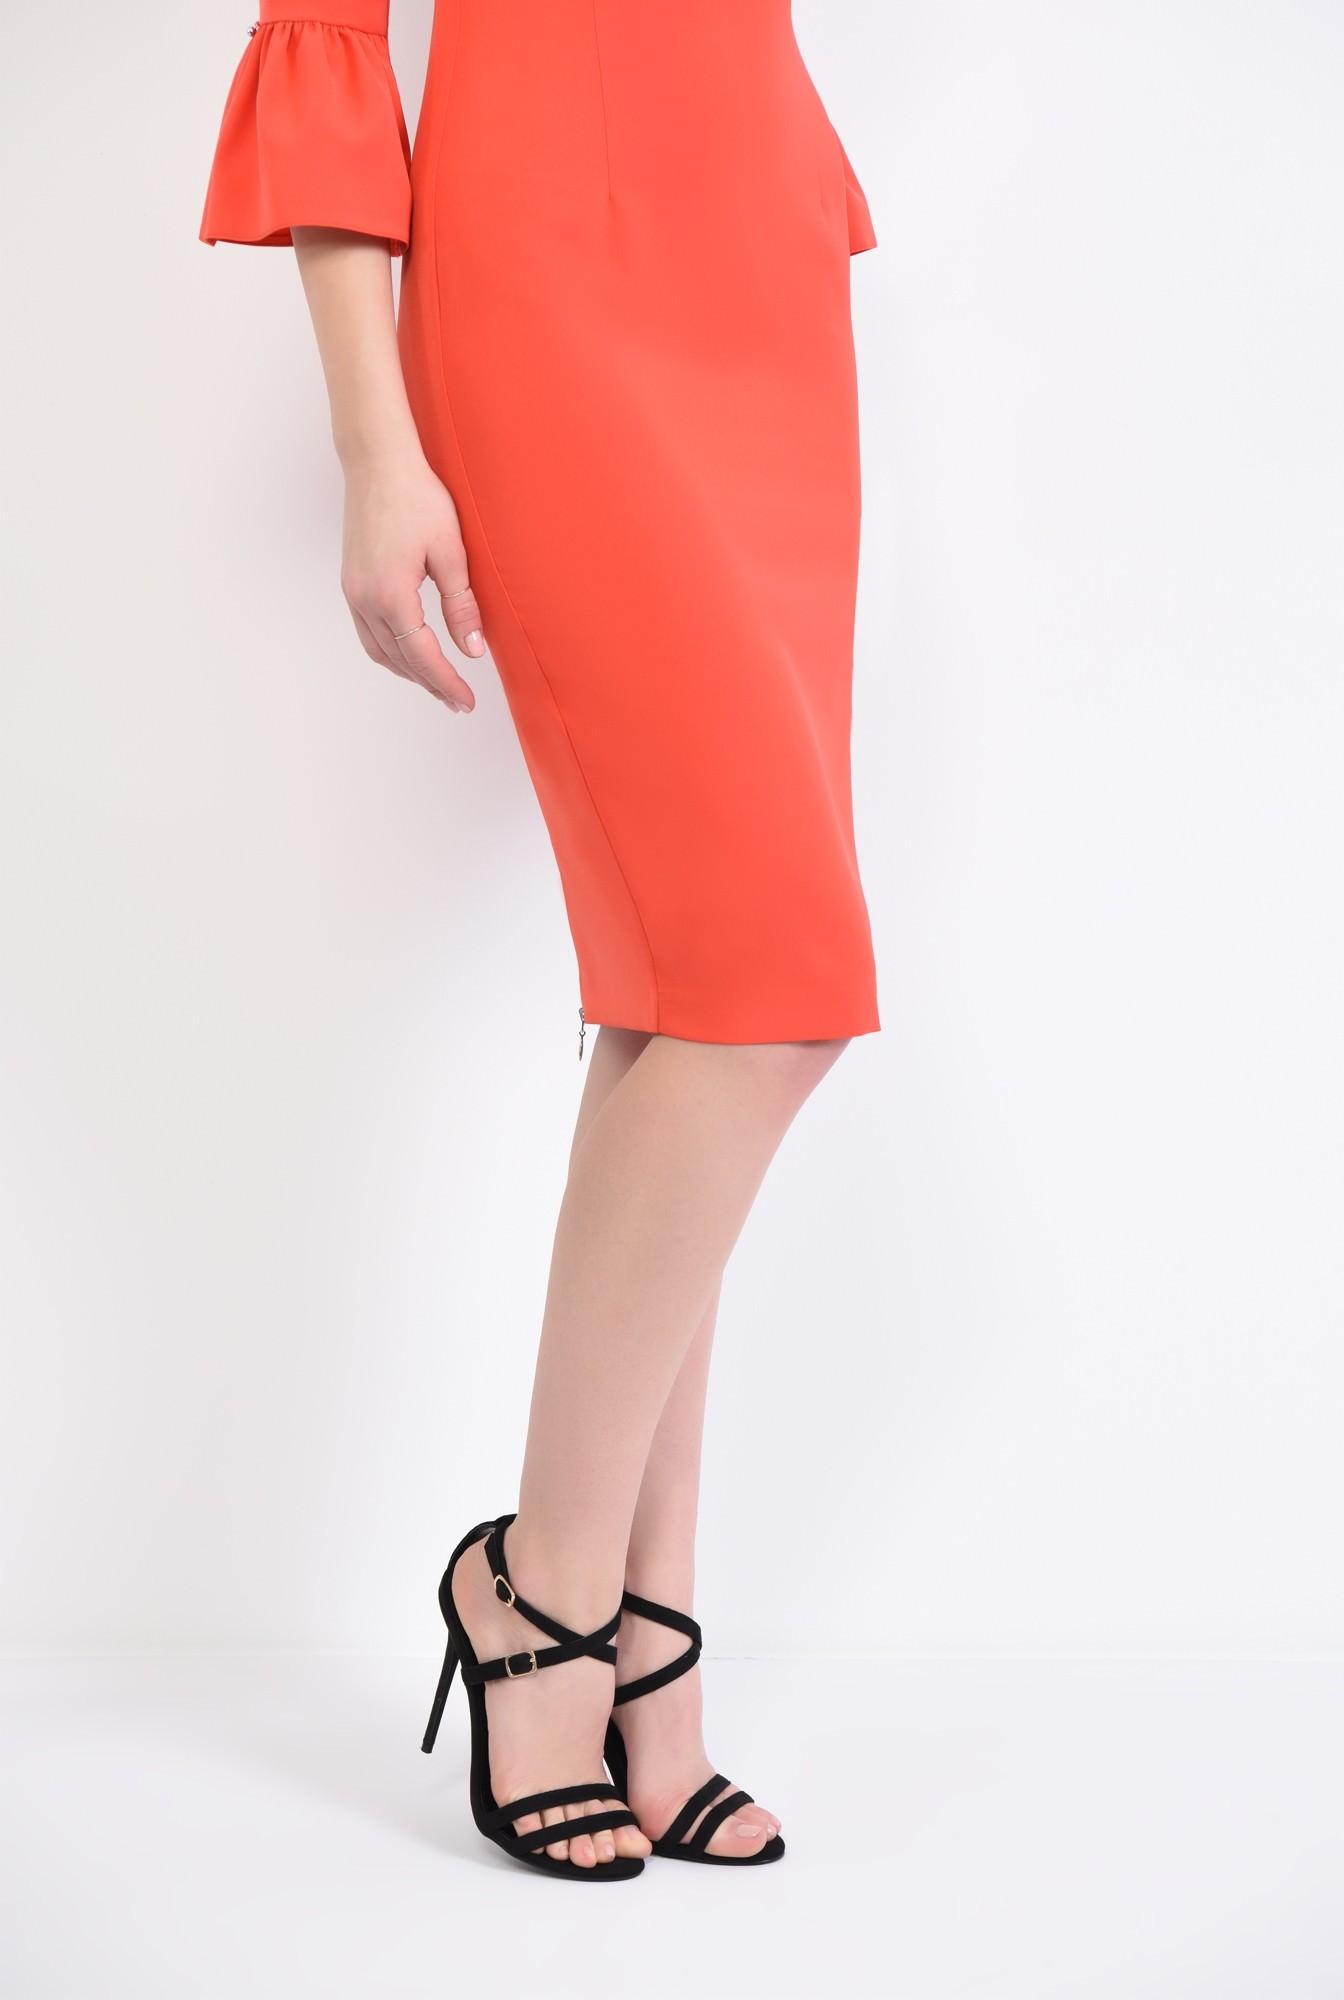 1 - sandale elegante, negru, stiletto, catifea